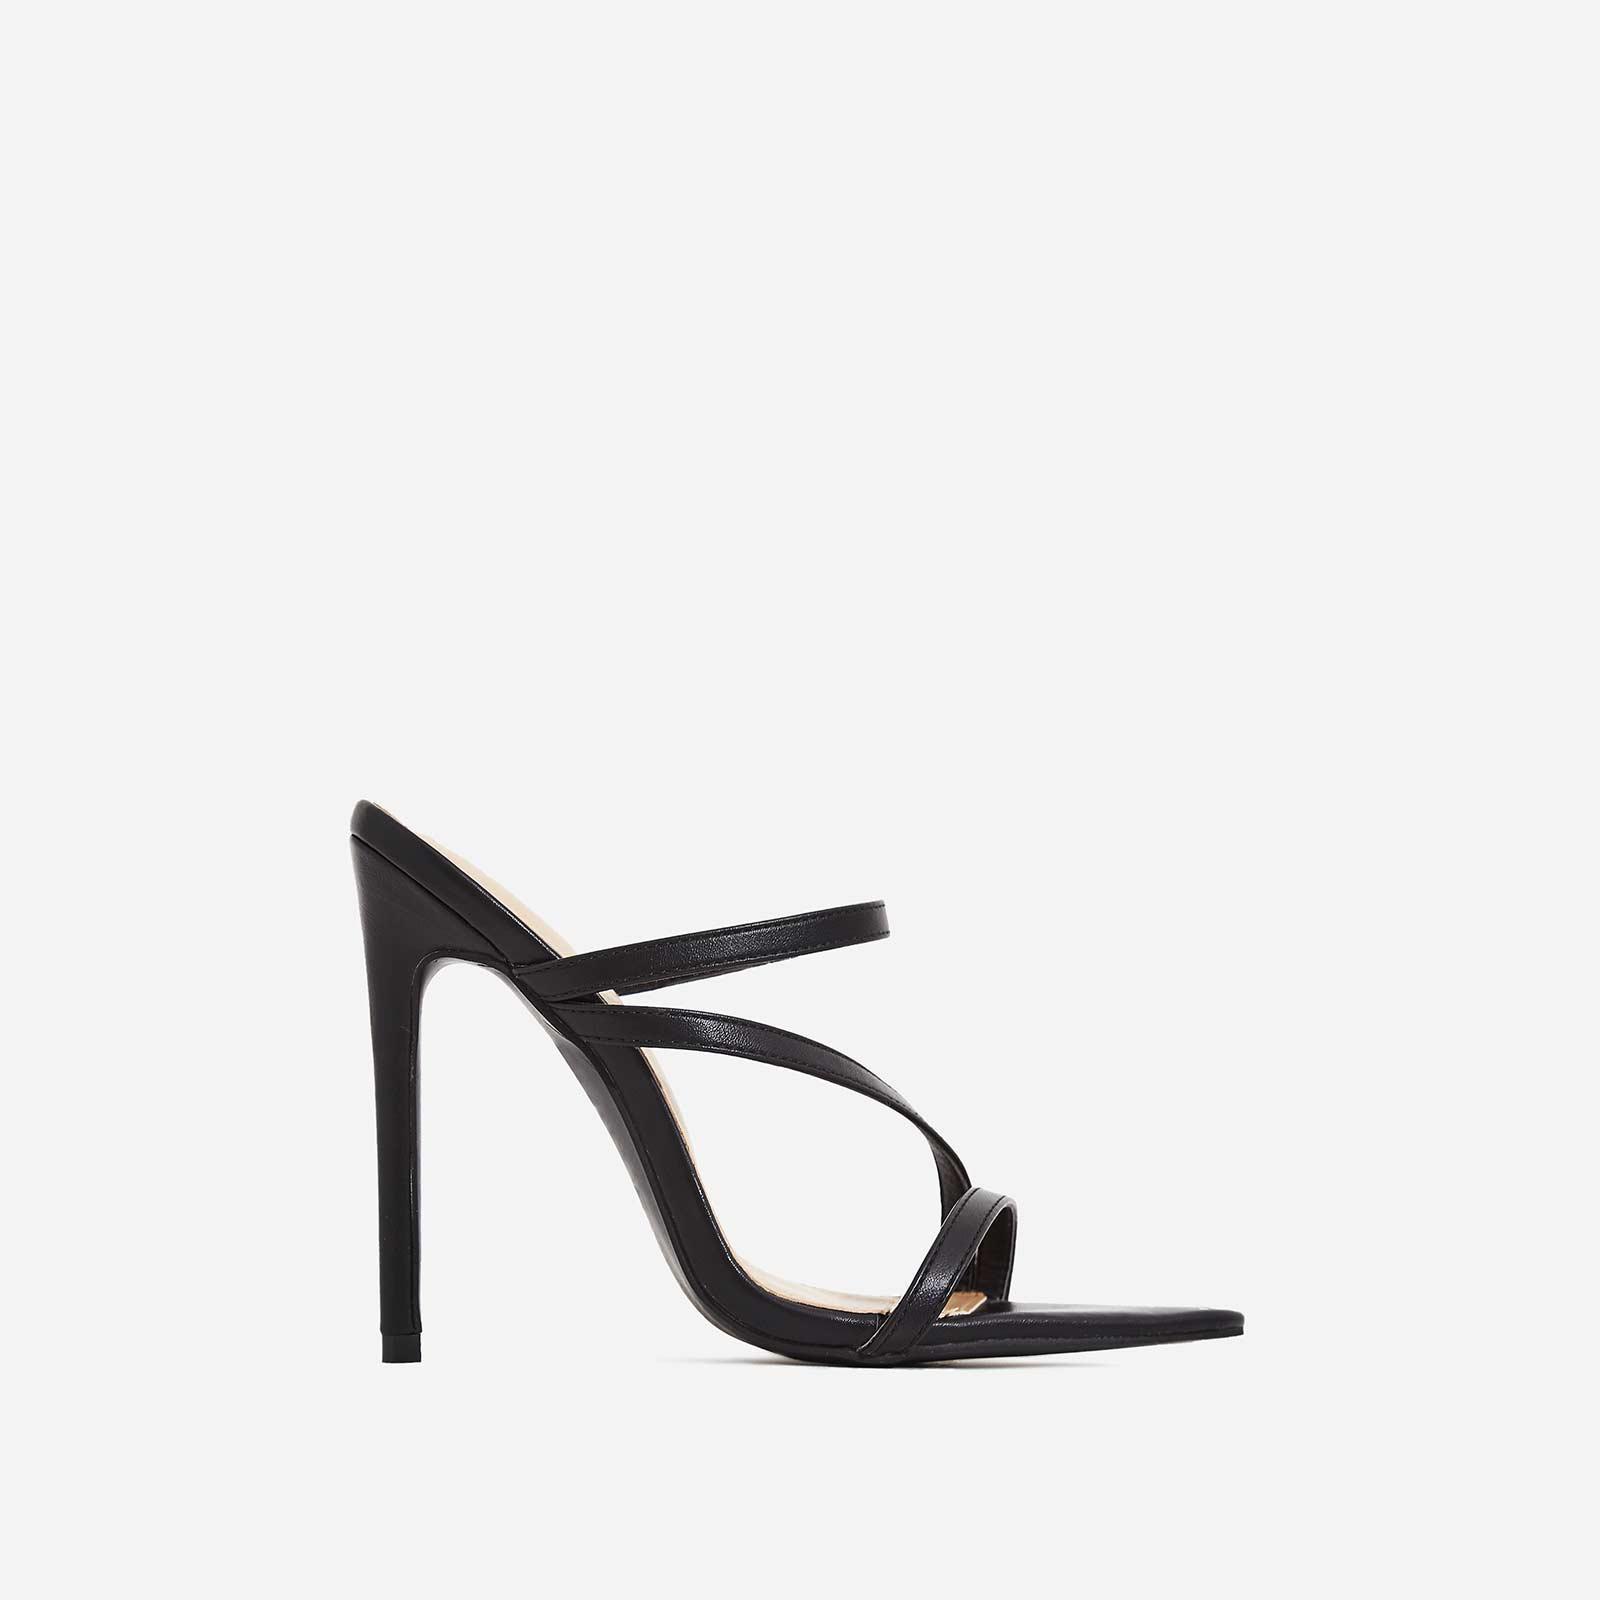 Aria Toe Strap Heel Mule In Black Faux Leather